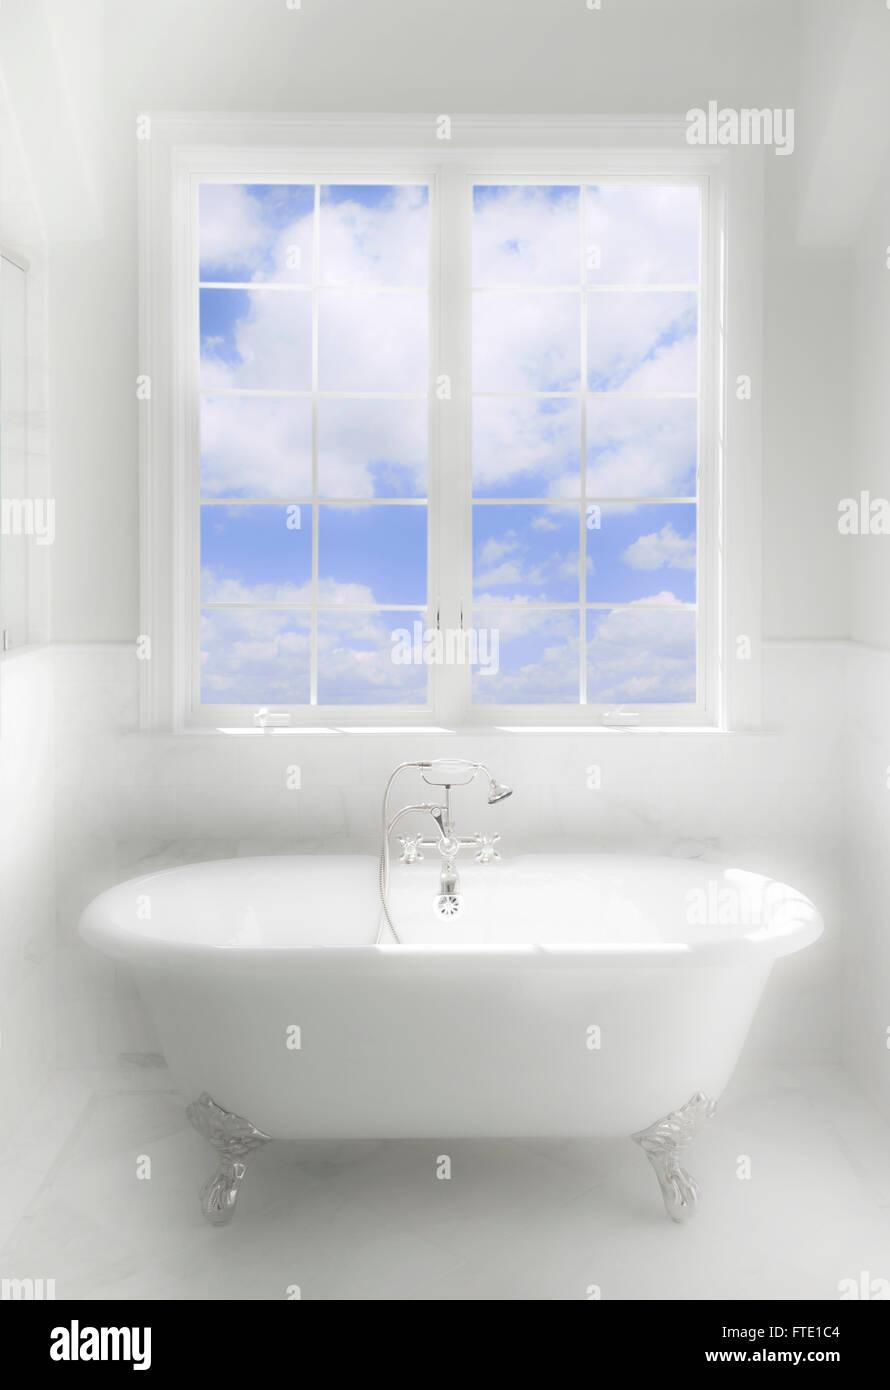 Deep Tub Stock Photos & Deep Tub Stock Images - Alamy